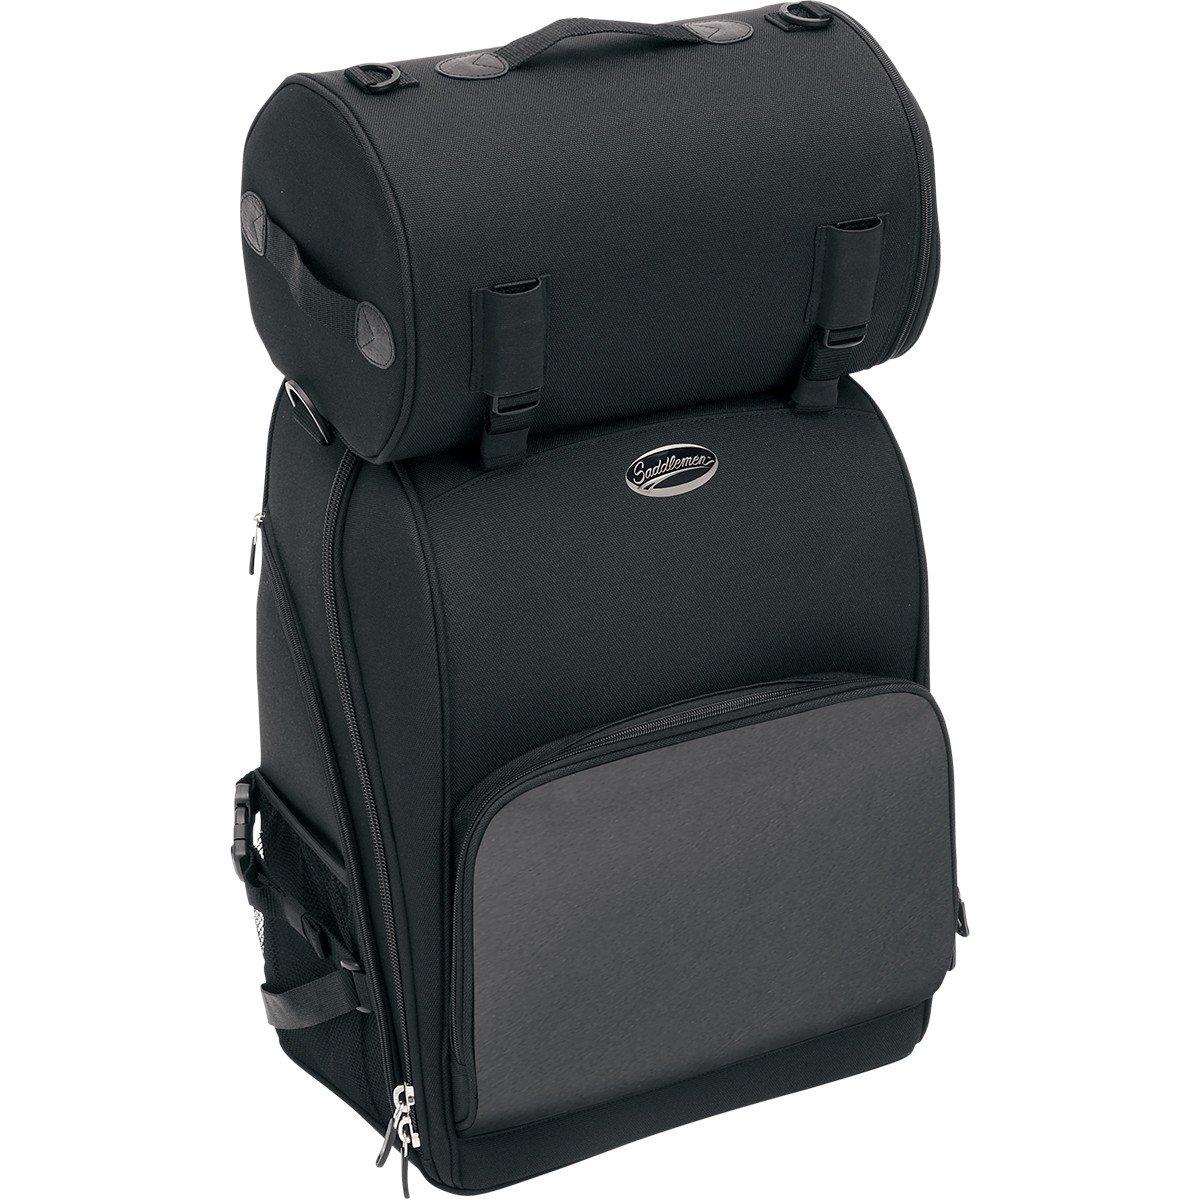 Borsa Sissy Bar Bag S2600 SADDLEMEN Universale Harley Davidson Custom Turismo 3515-0081